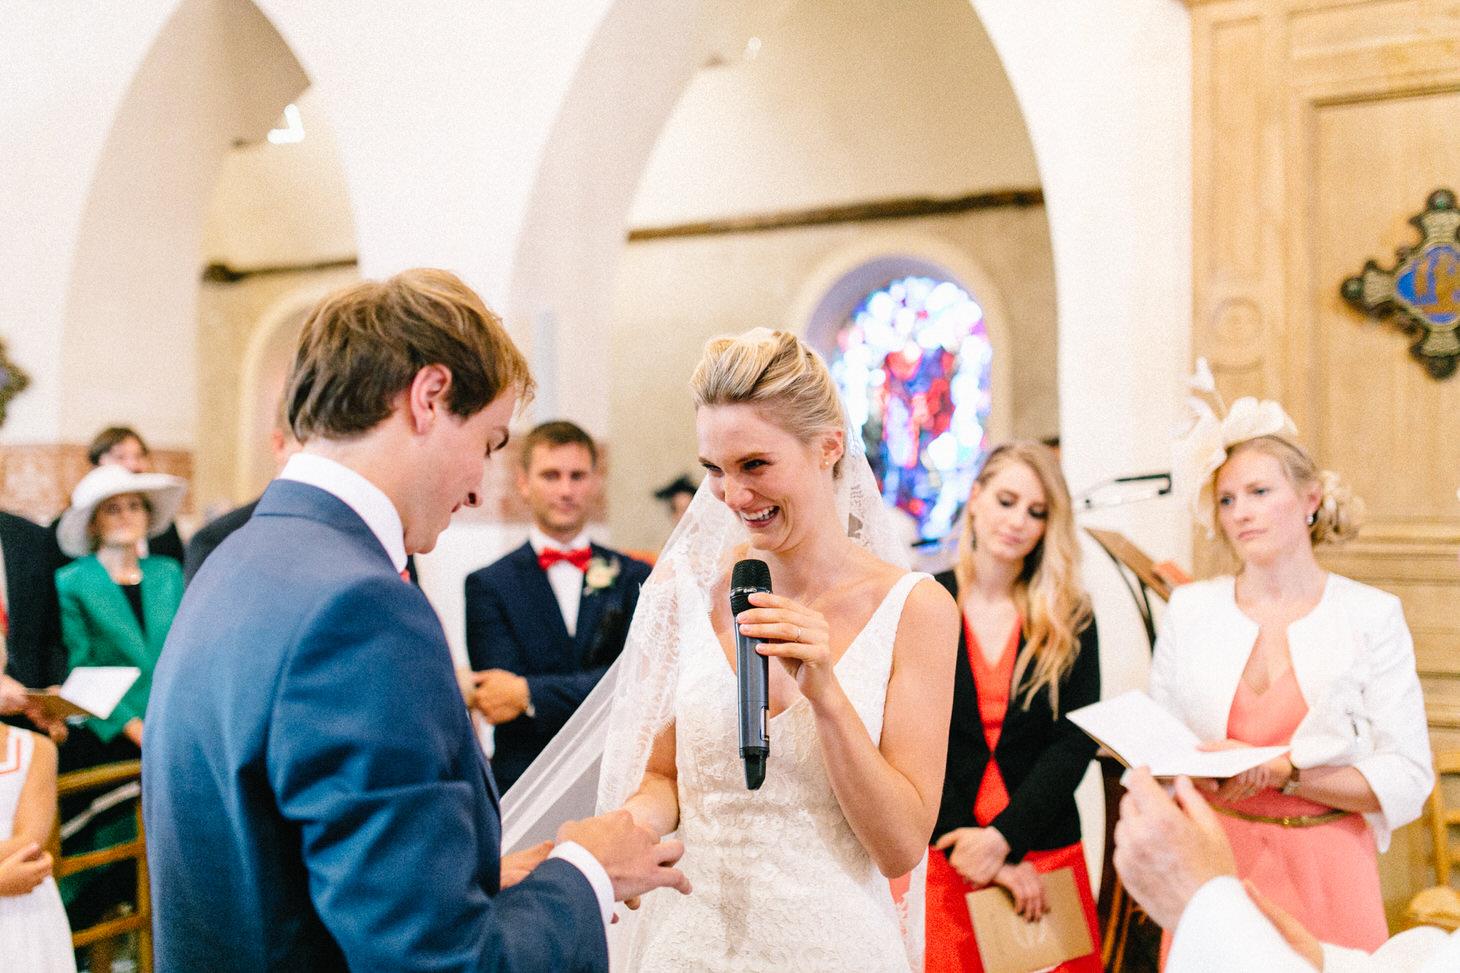 photographe-mariage-paris-montfort-l-amaury-031